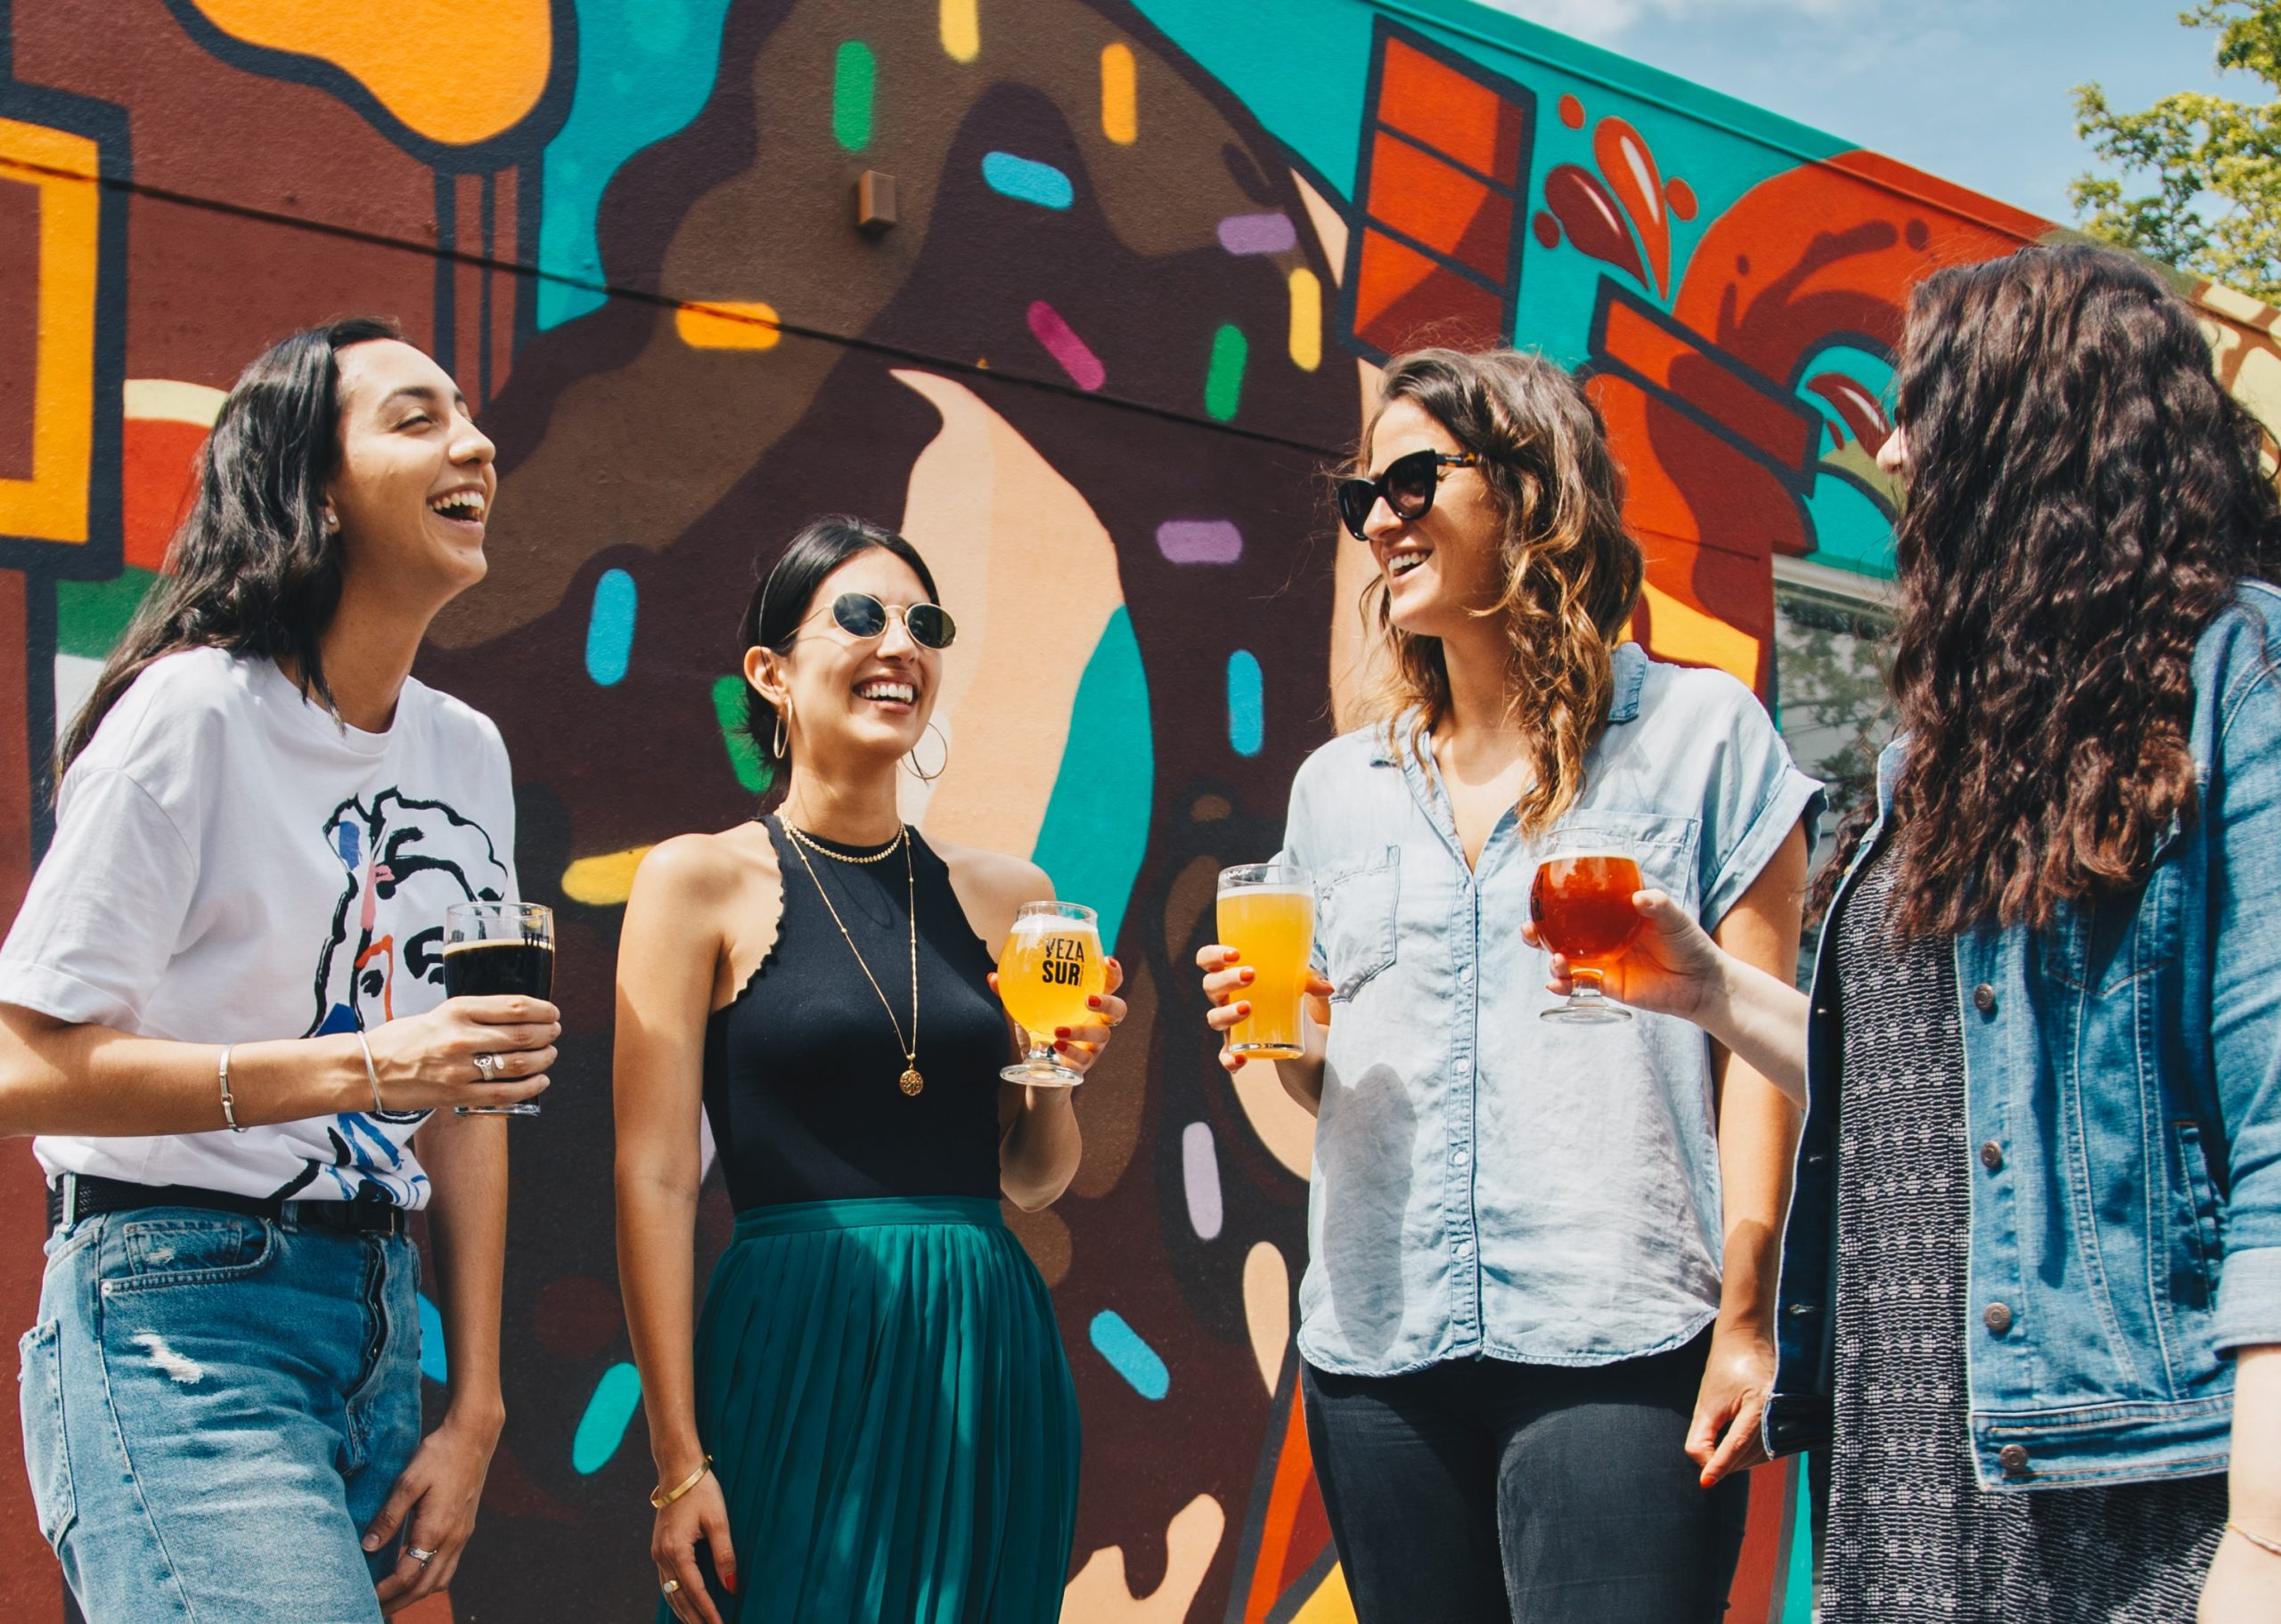 Hard seltzer : La boisson des millennials